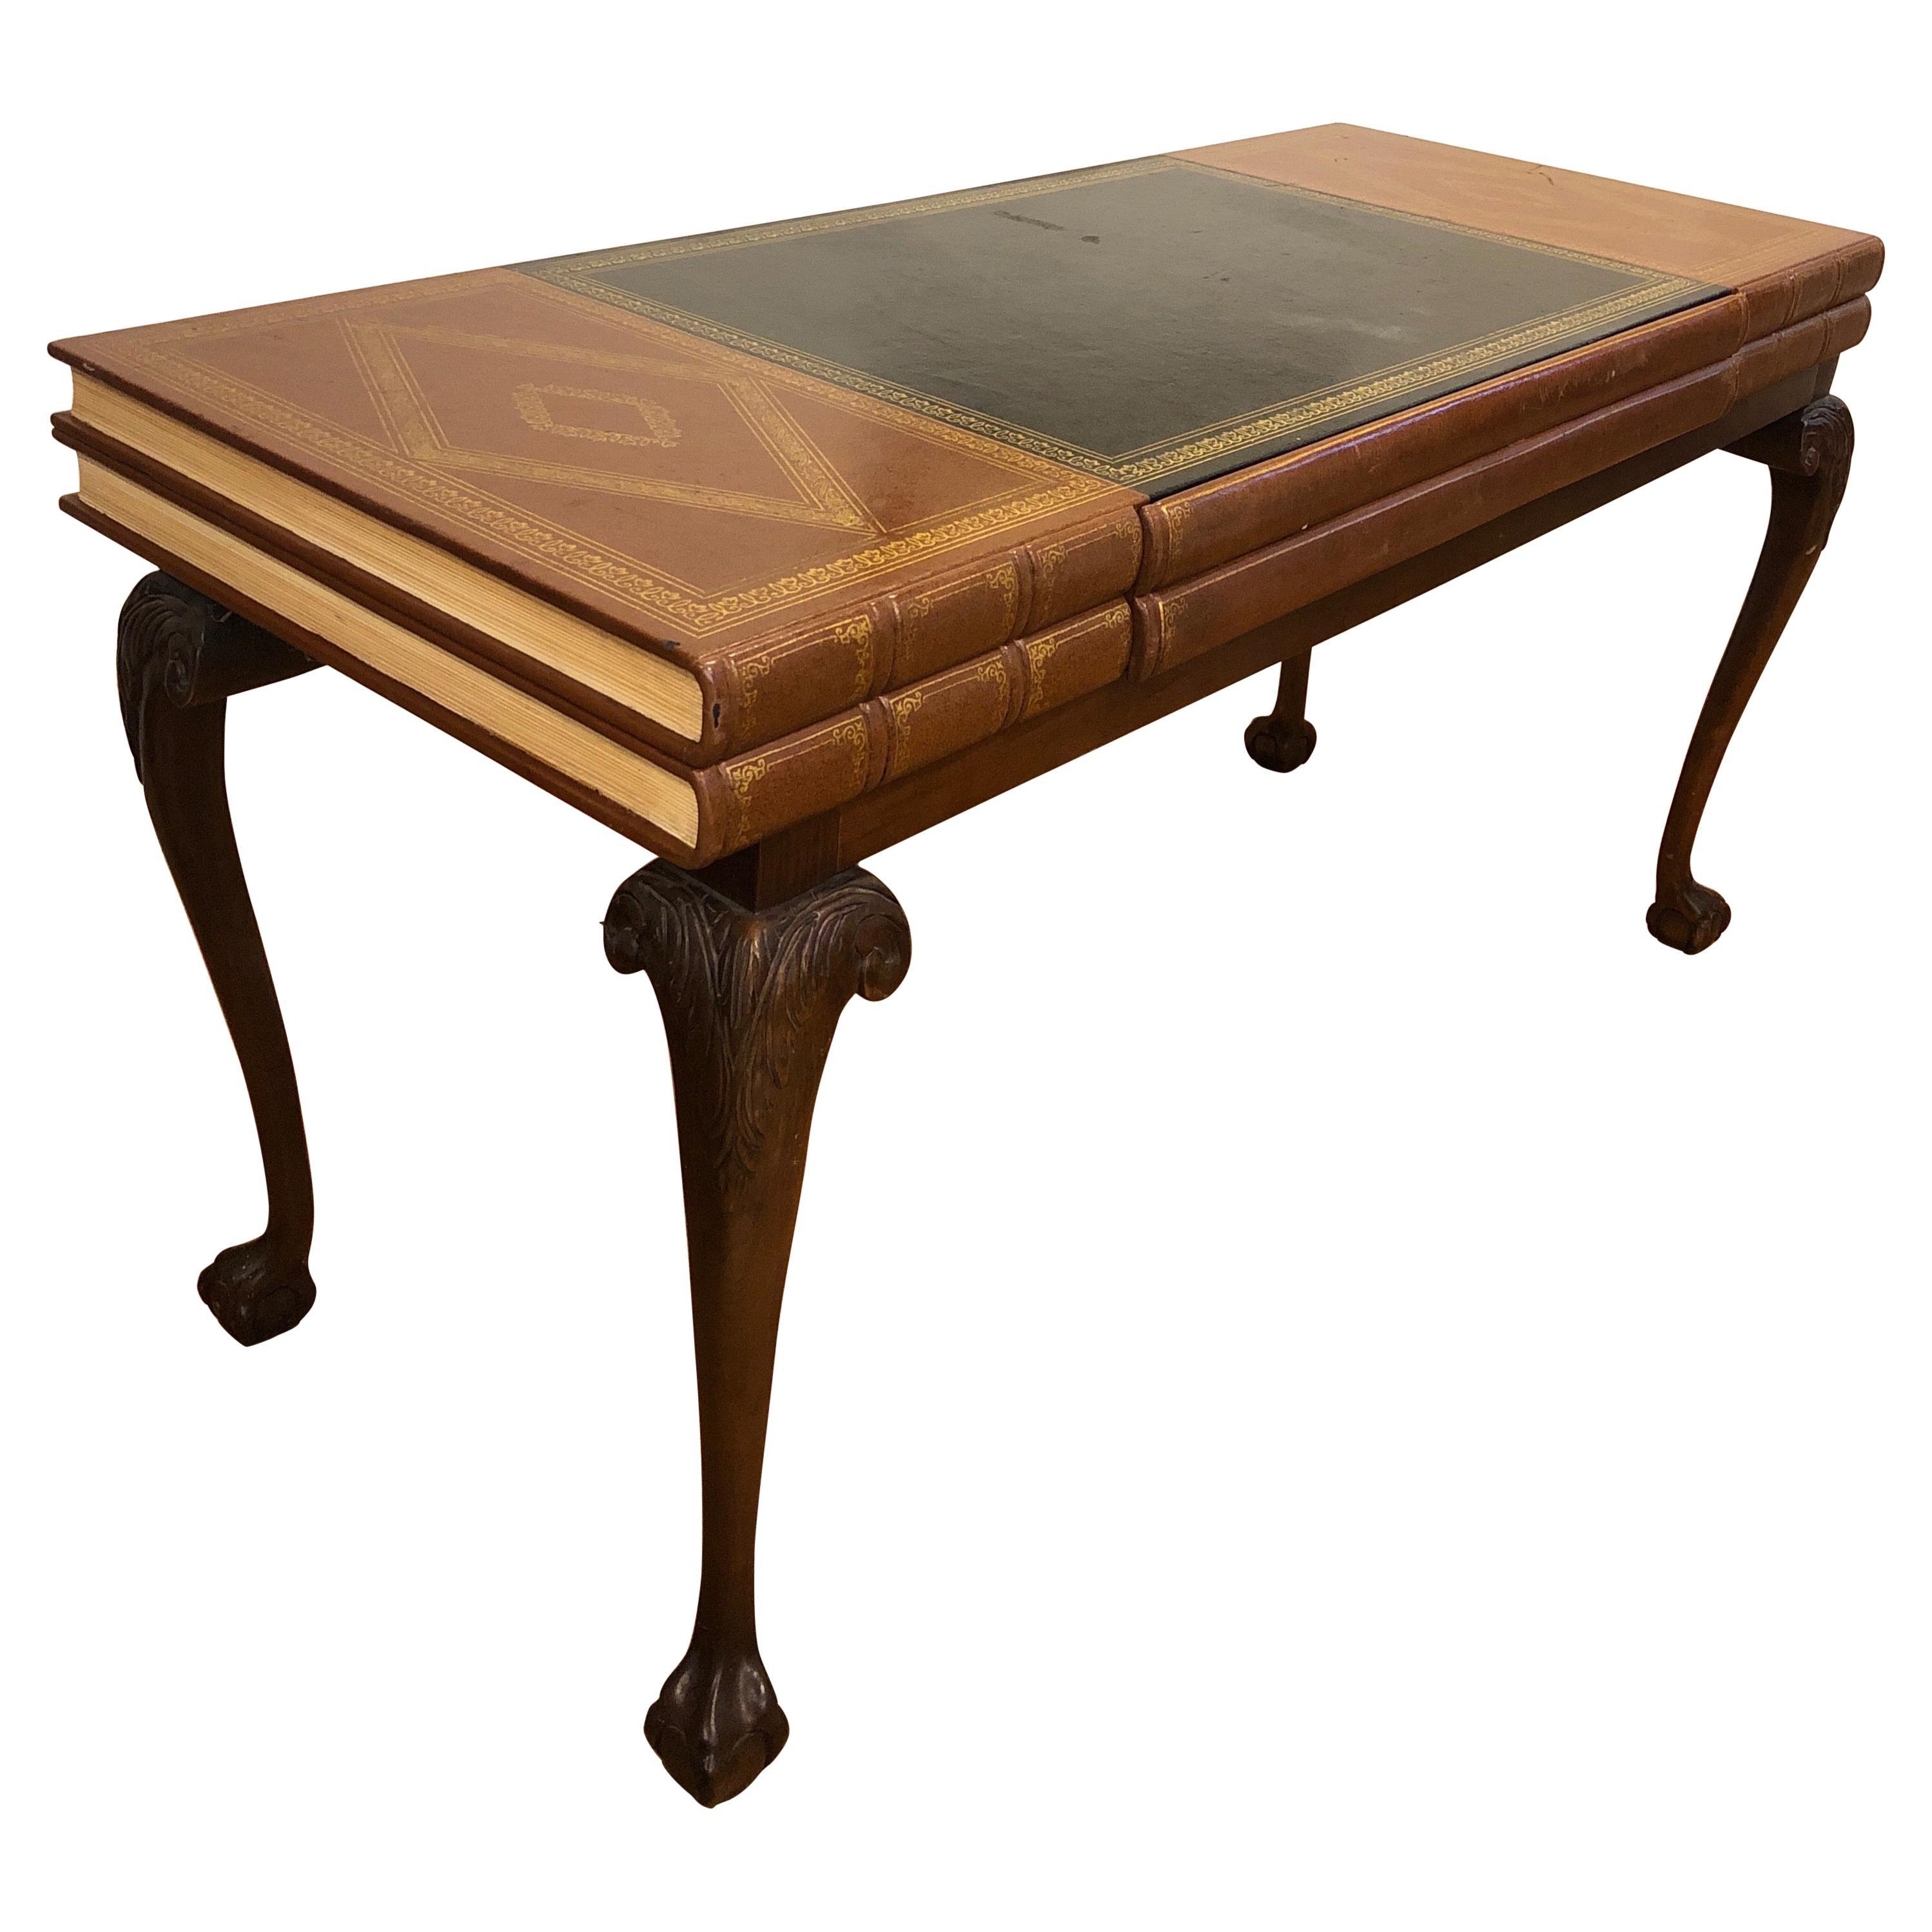 Vintage Custom Pulaski Writing Desk, Style of Theodore Alexander/Maitland Smith